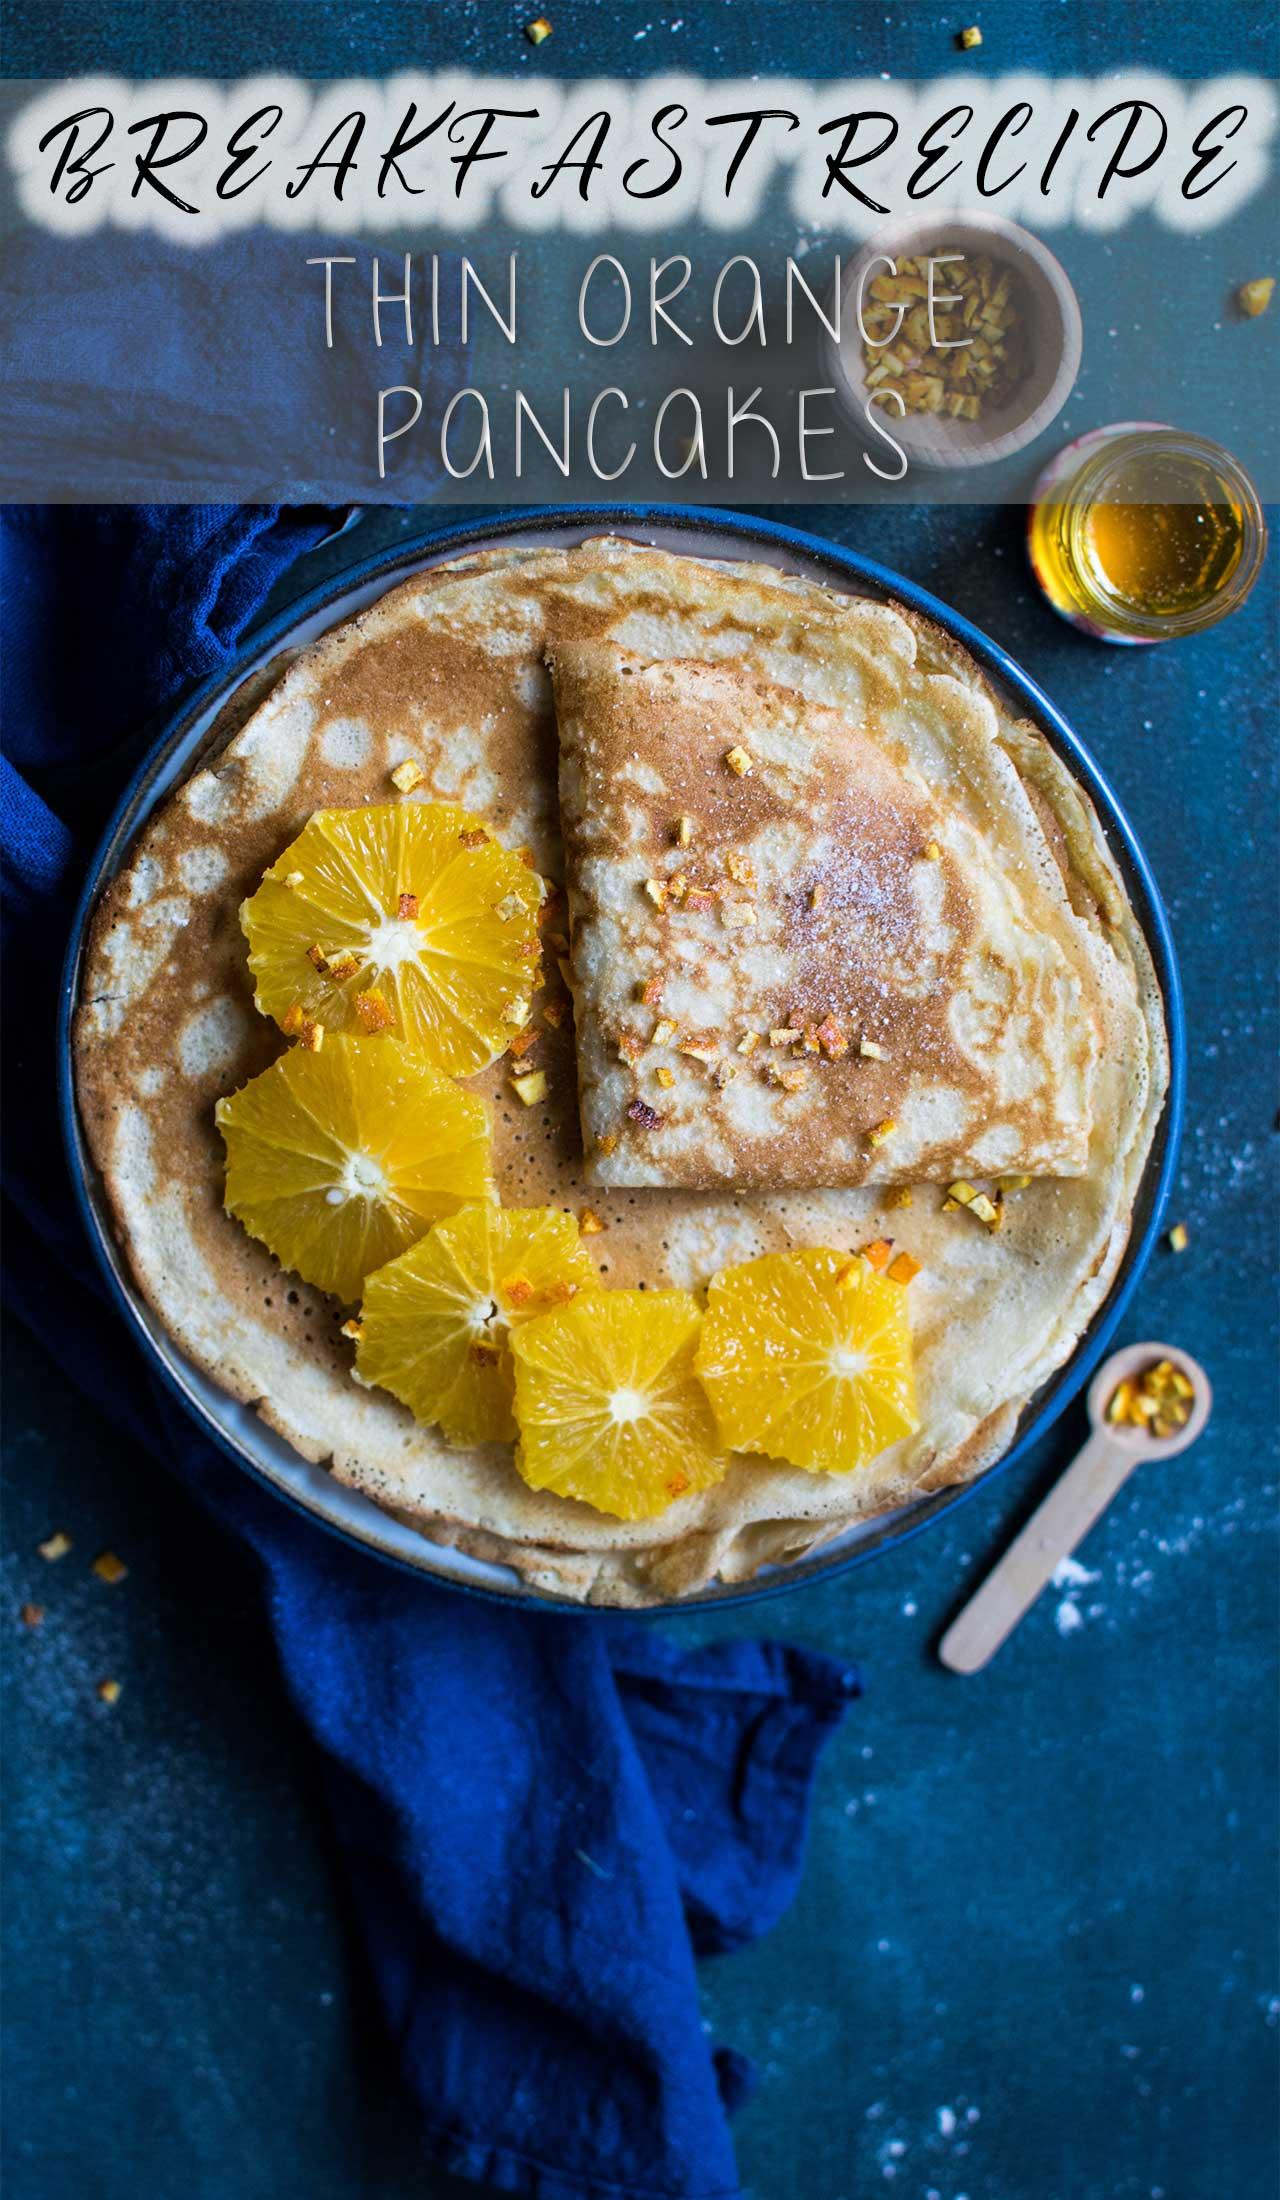 breakfast recipe, orange pancake recipe